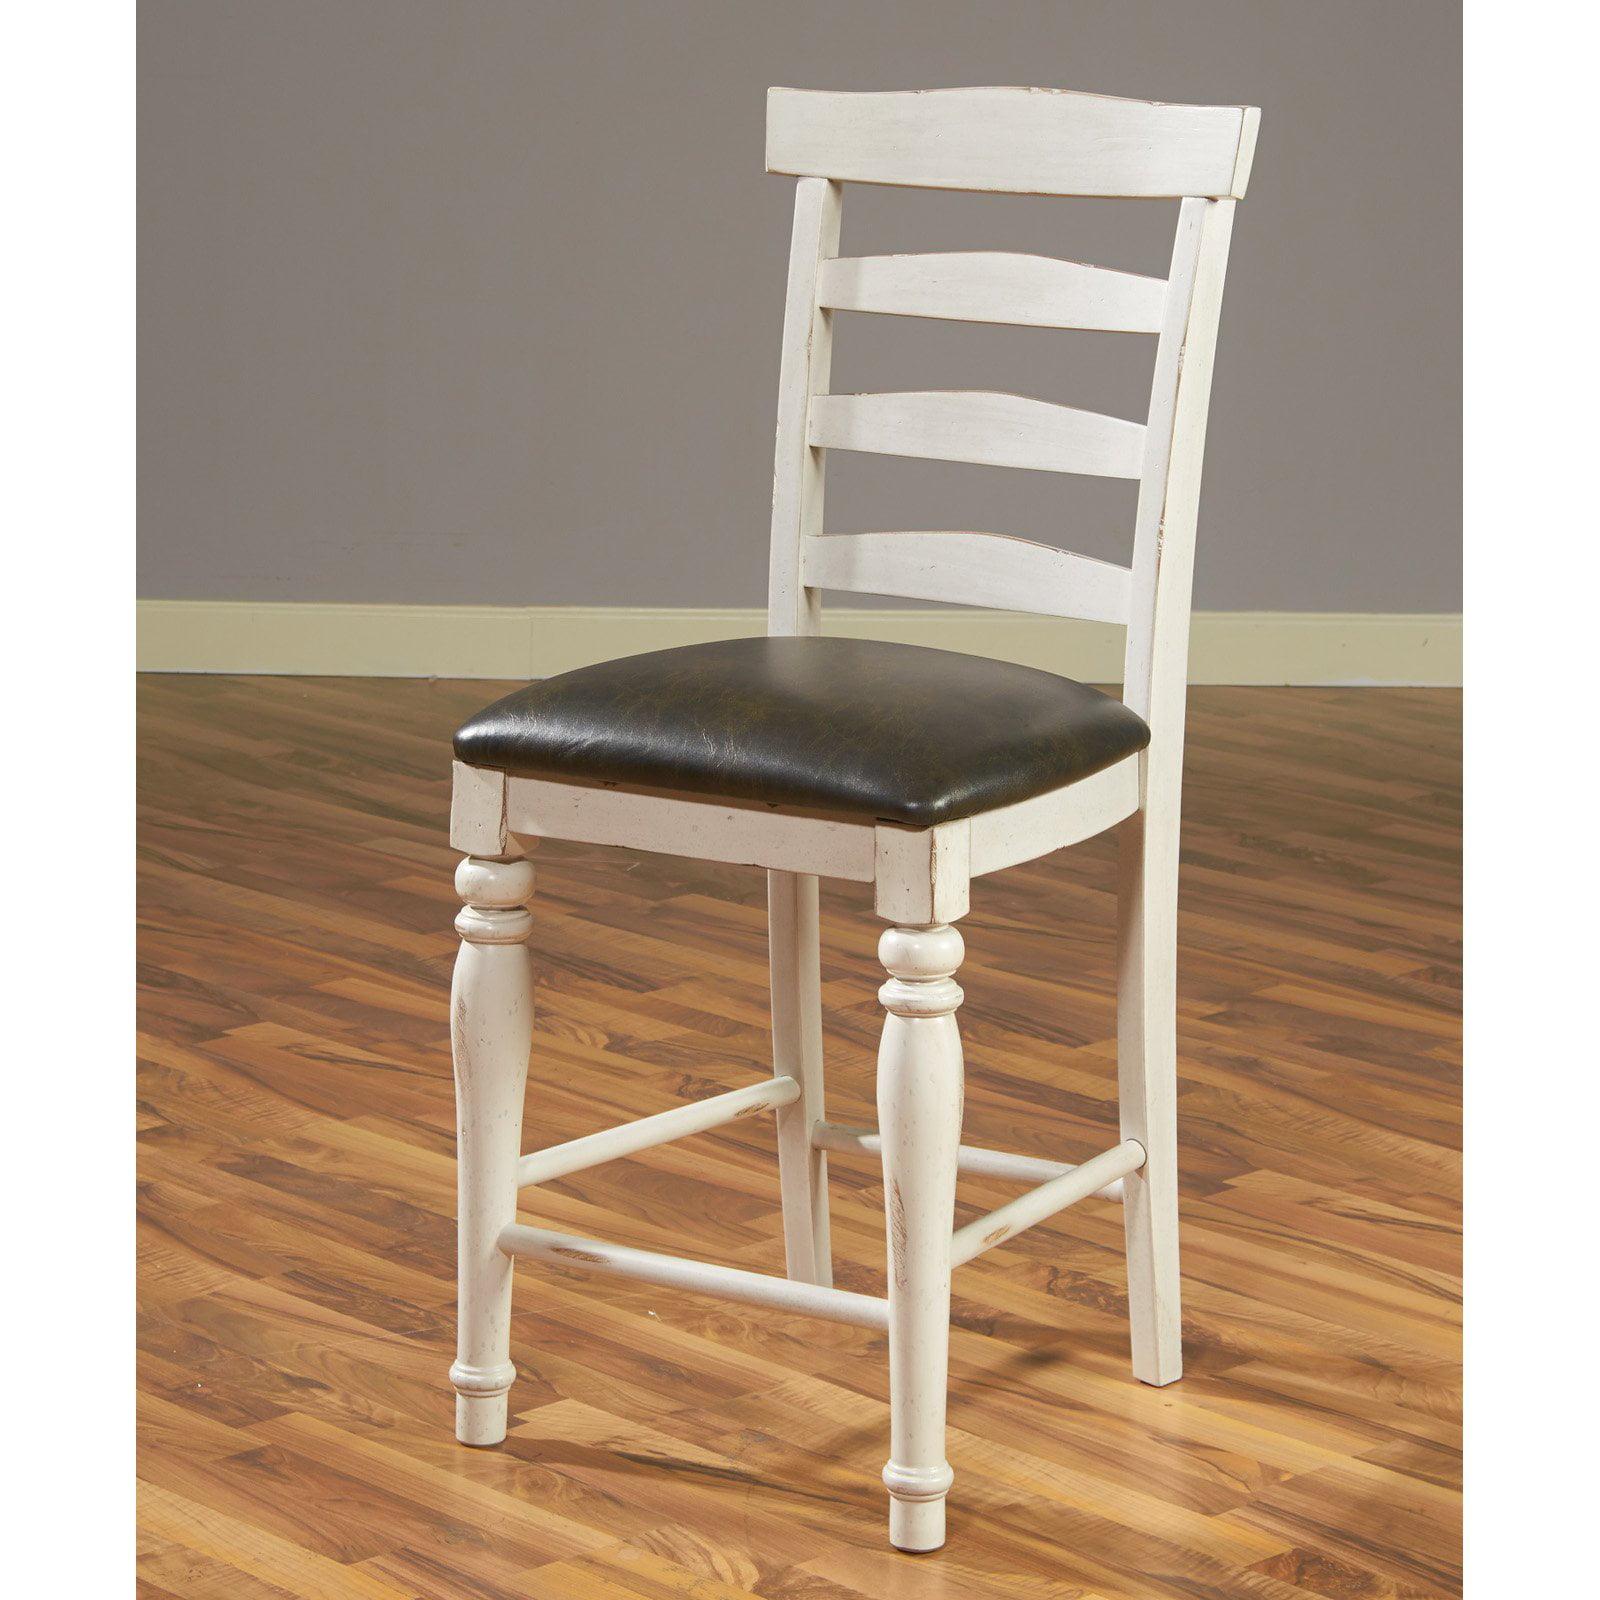 Sunny Designs Bourbon 24 In Ladder Back Upholstered Counter Stool